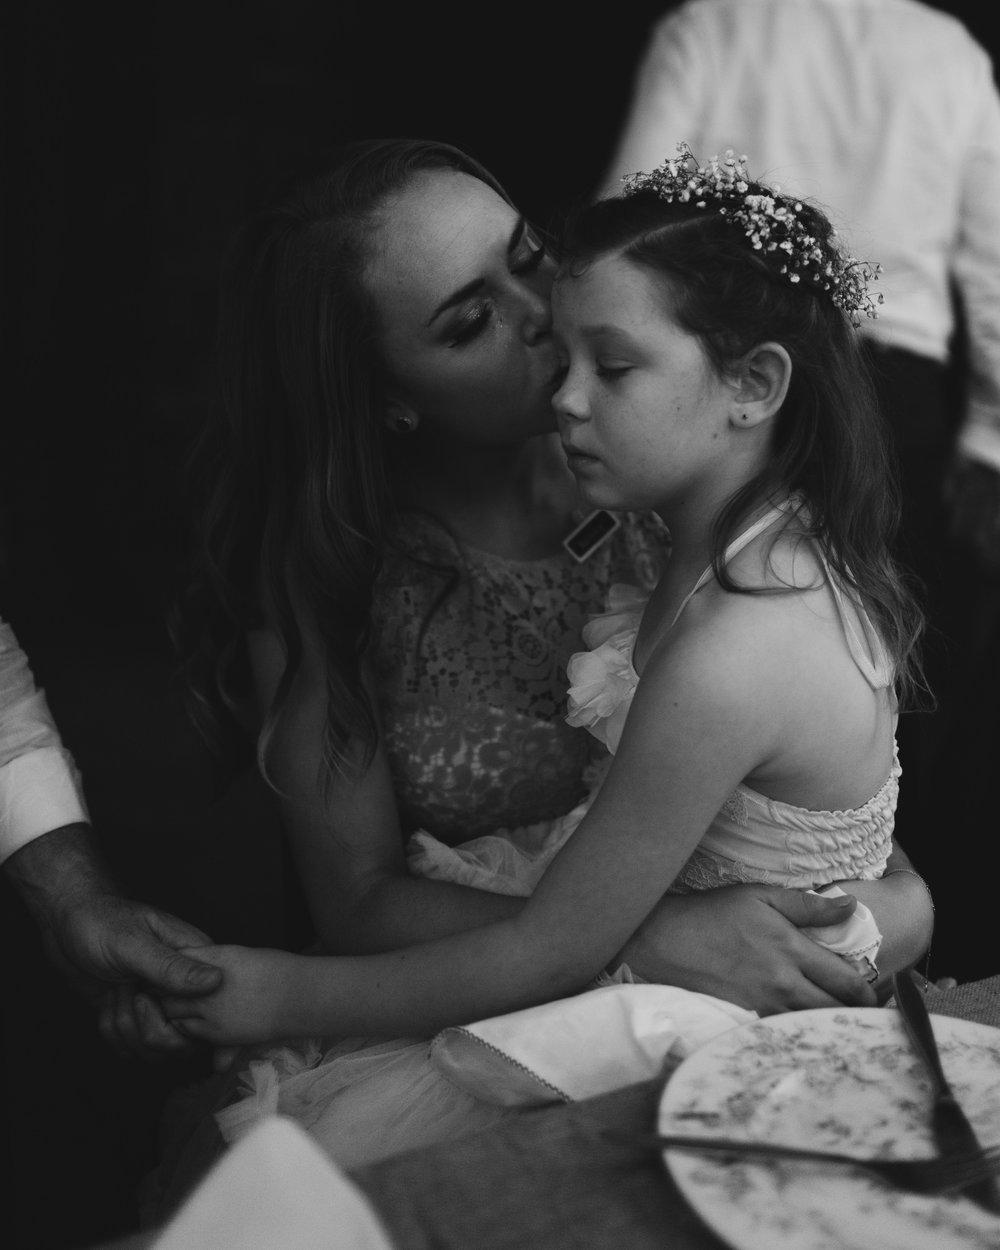 CARTER-ROSE-PHOTOGRAPHY-NICHOLAS-WEDDING-NANGA-BUSH-CAMP810.JPG